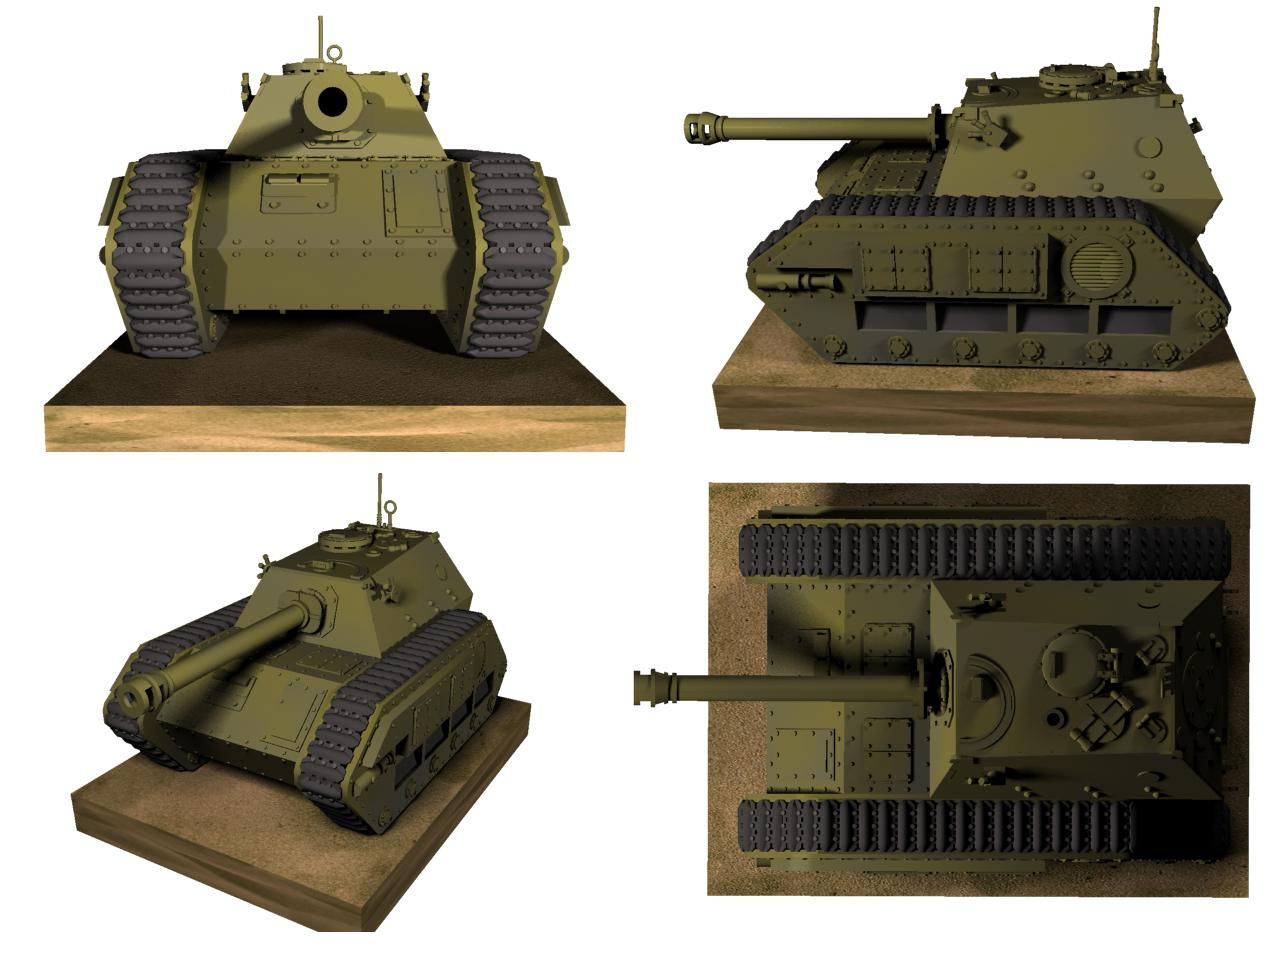 3d Printed, 3d Printing, Alternative, Armor, Destroyer, Elefant, Germans, Guard, Hunter, Imperial, Militarum, Miniature, Nazi, Tank, Warhammer 40,000, Warhammer Fantasy